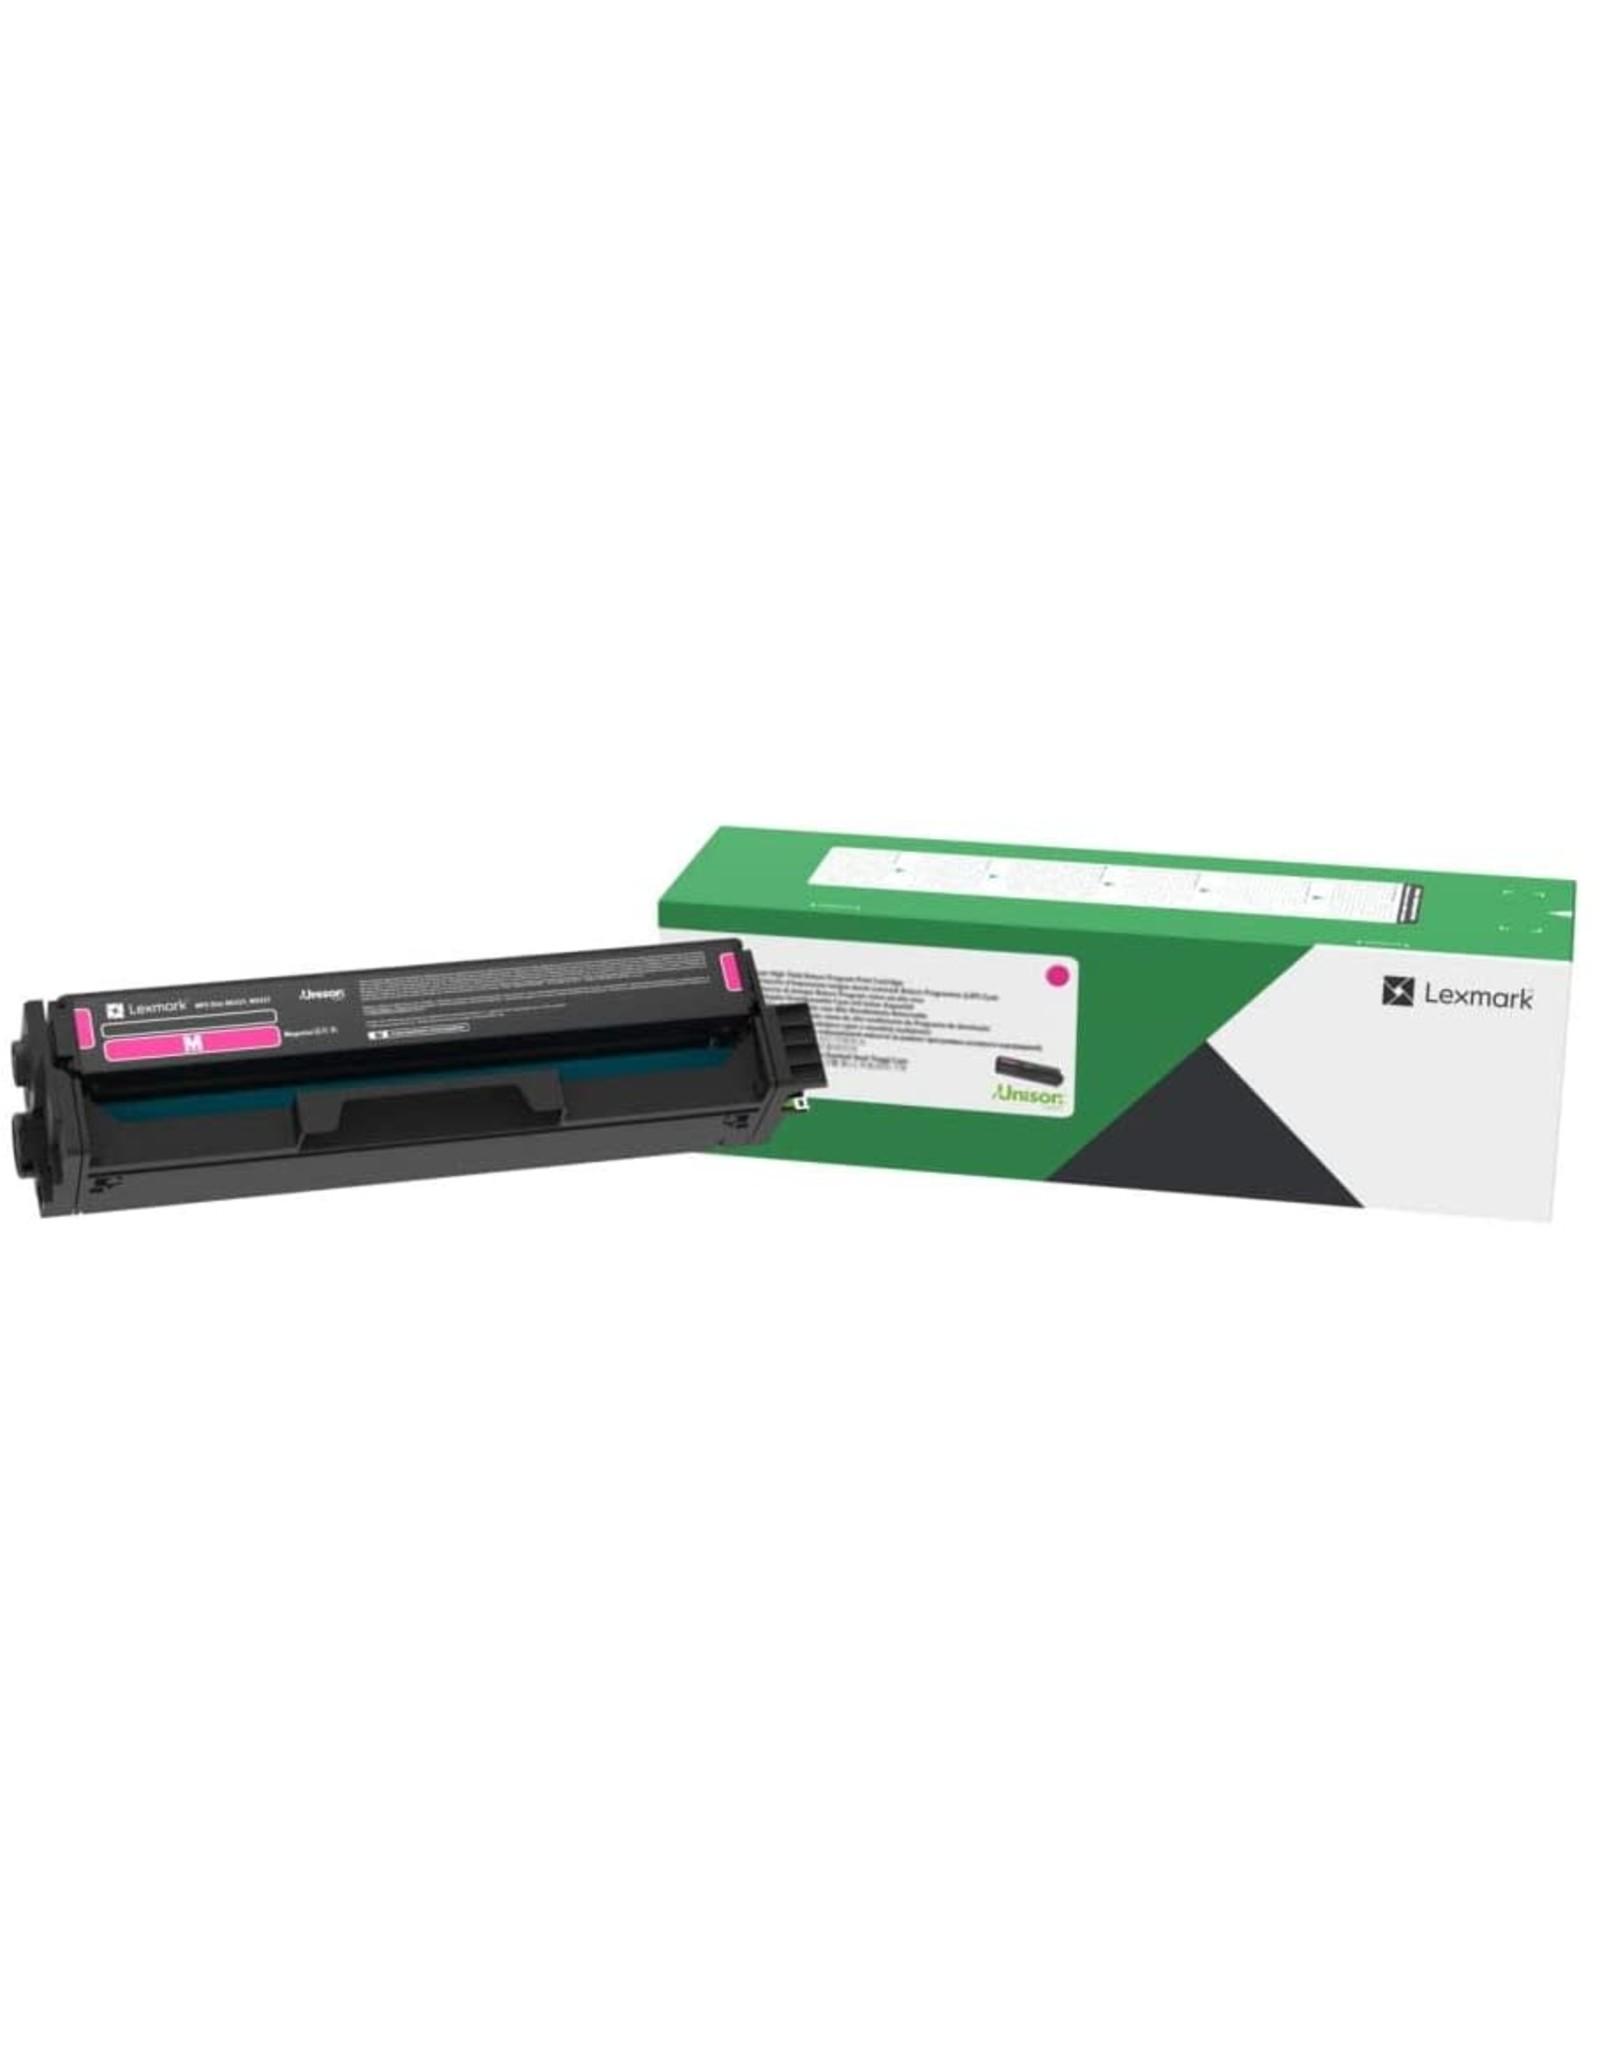 Lexmark Lexmark C3210M0 Magenta Return Program Print Cartridge